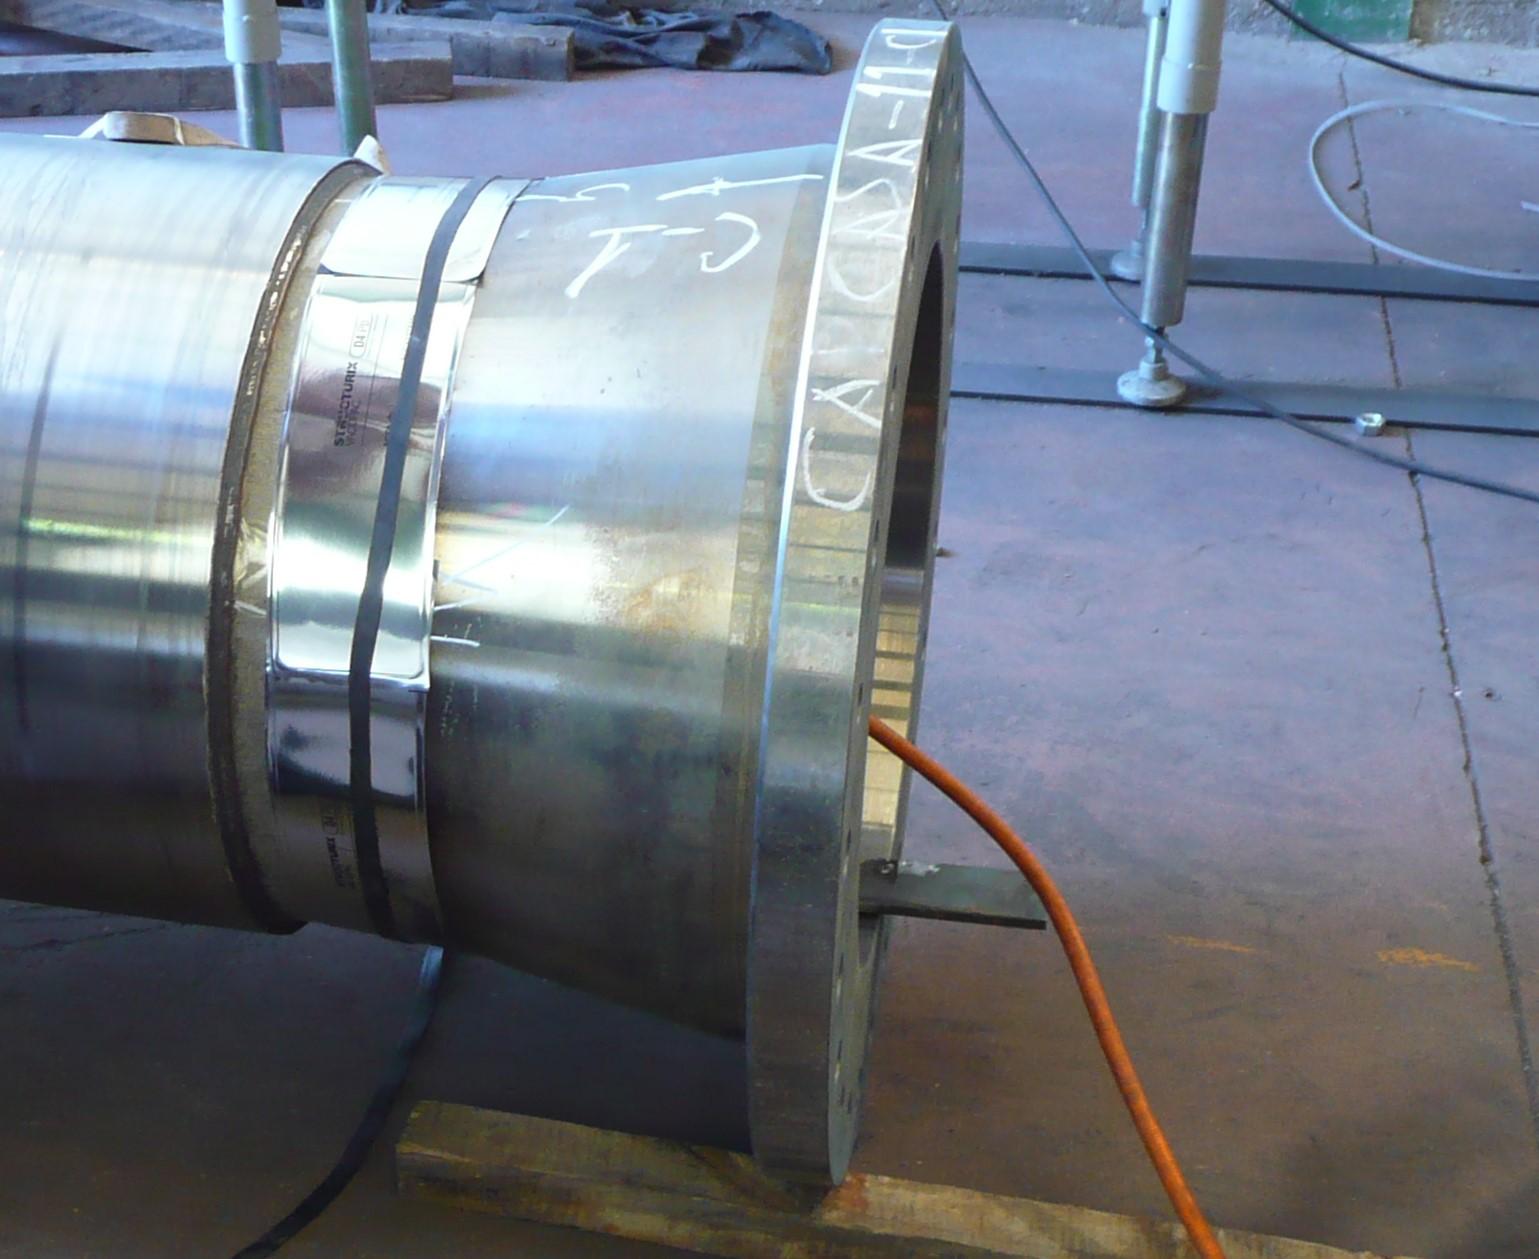 P1000099 - Welding inspection